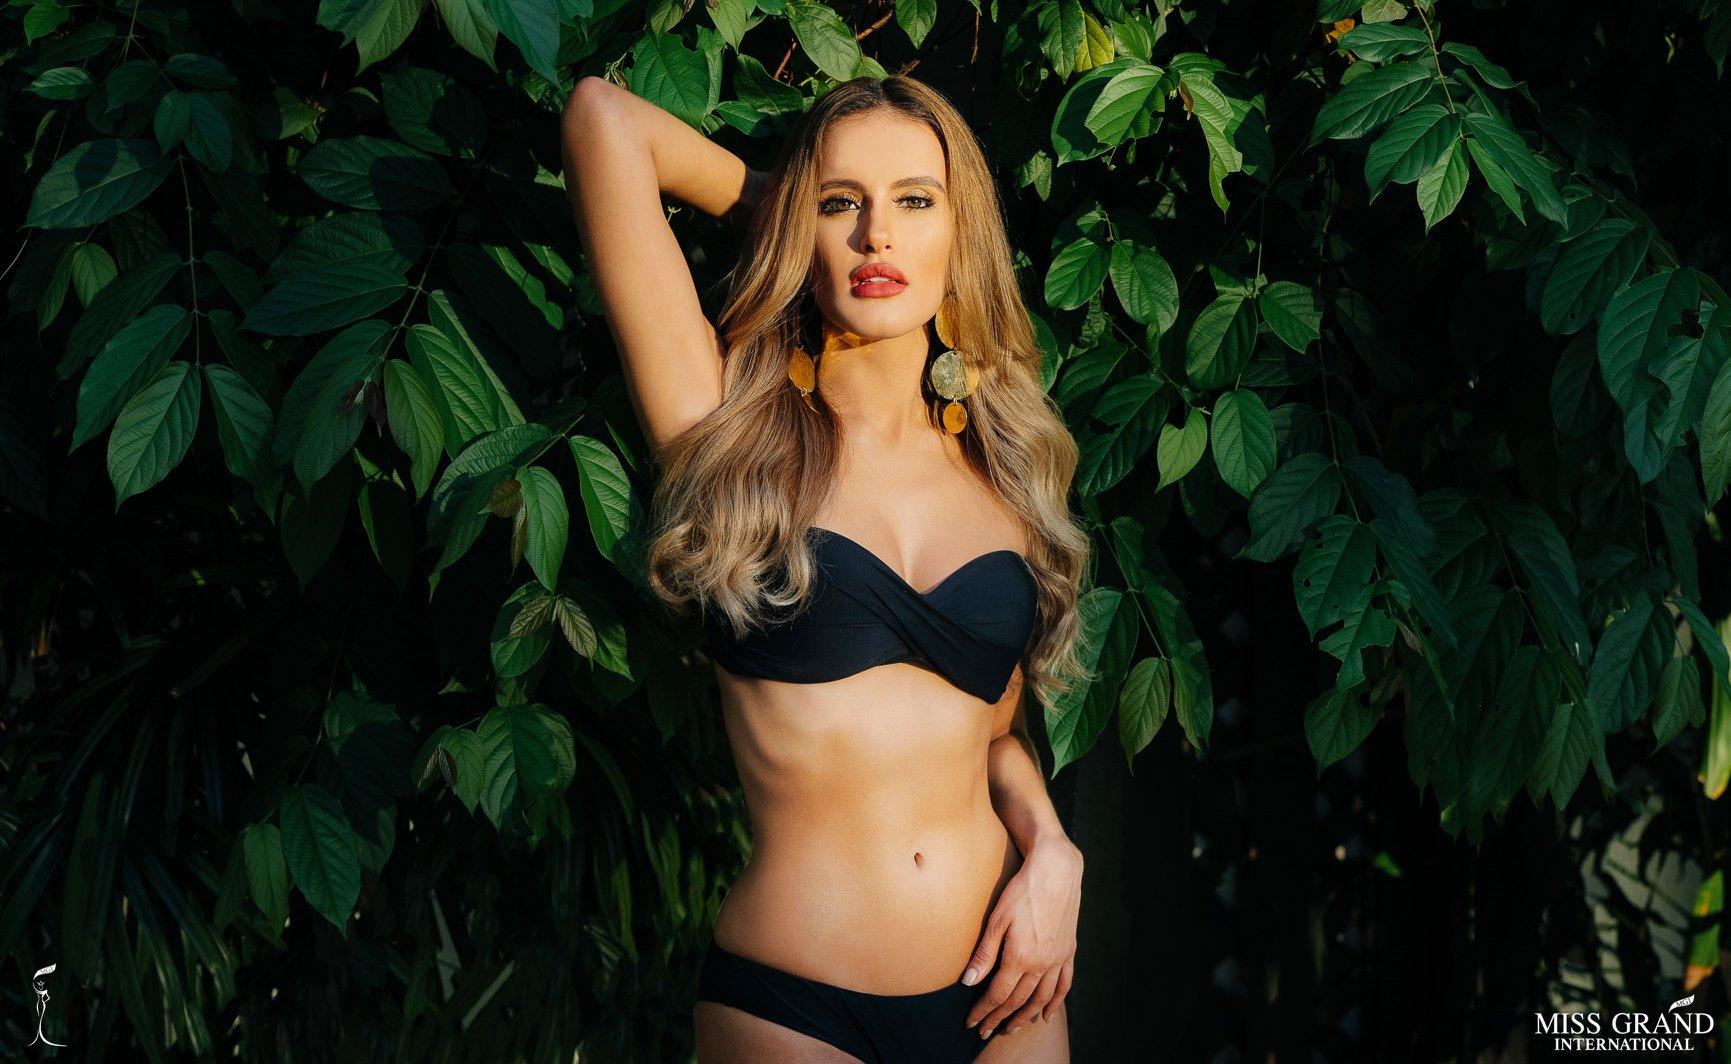 sheyla quizena, miss grand colombia 2018. - Página 6 Cjudnx10